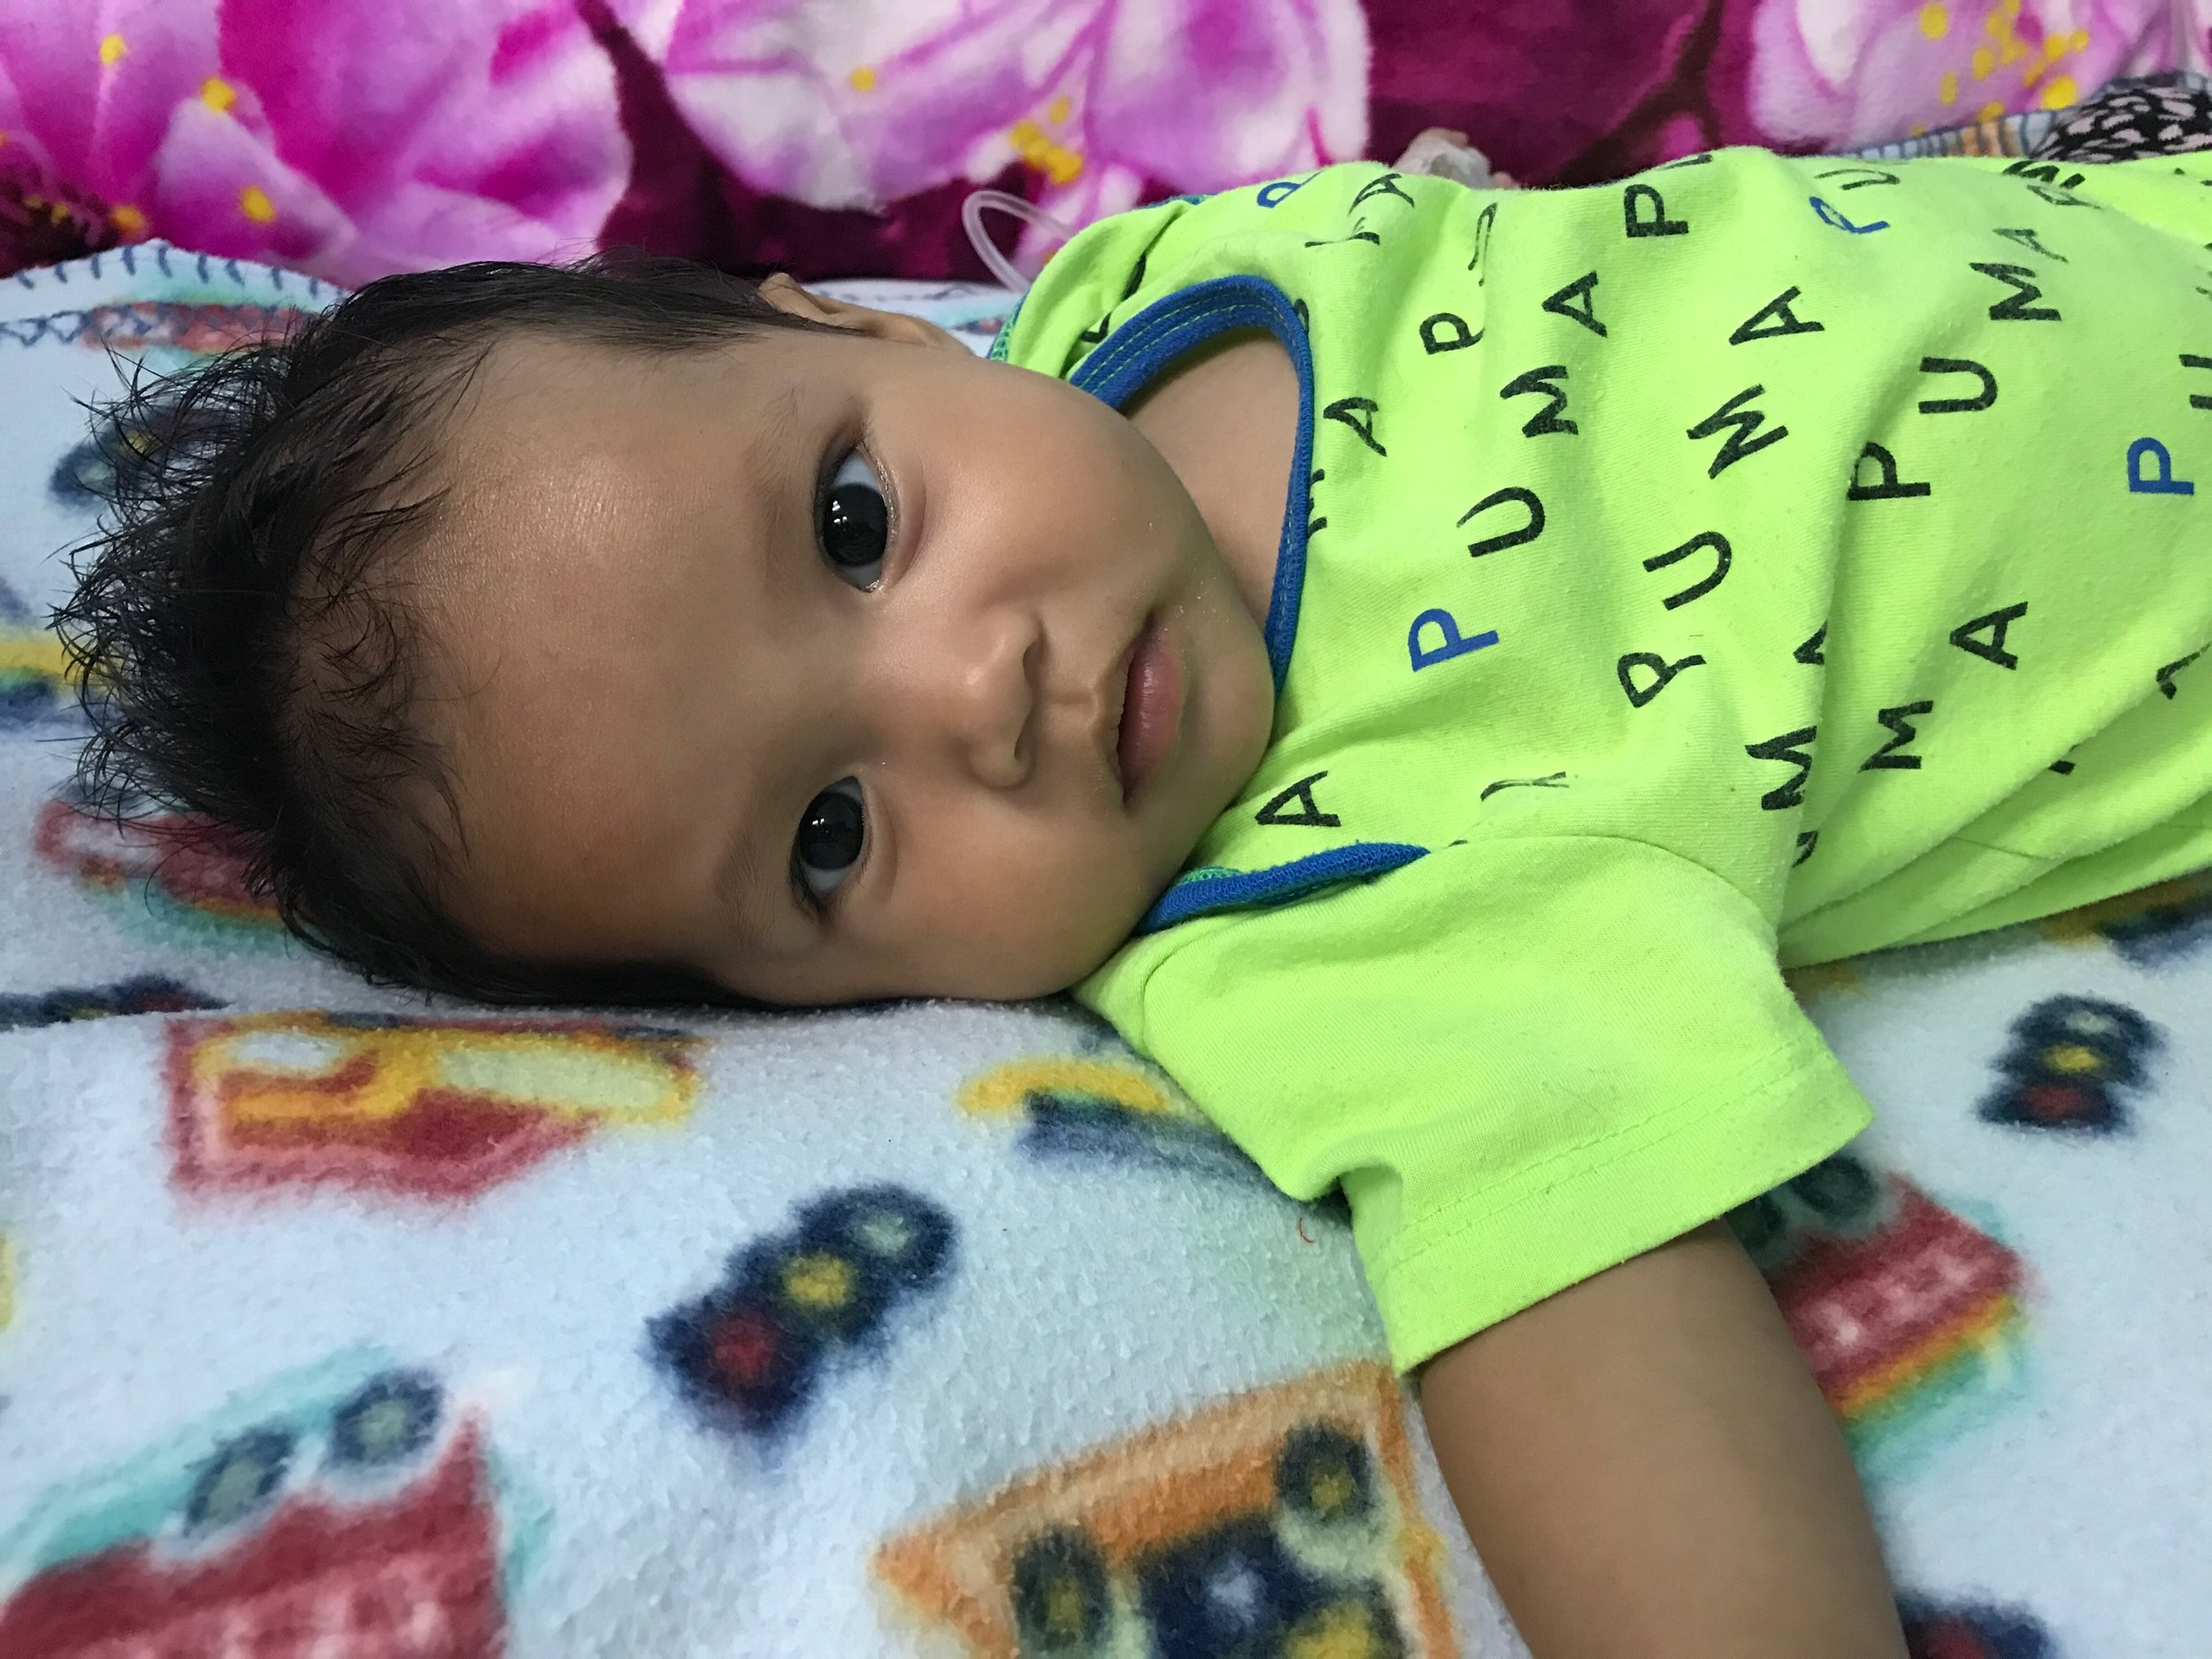 Beatiful Baby in Hospital.JPG